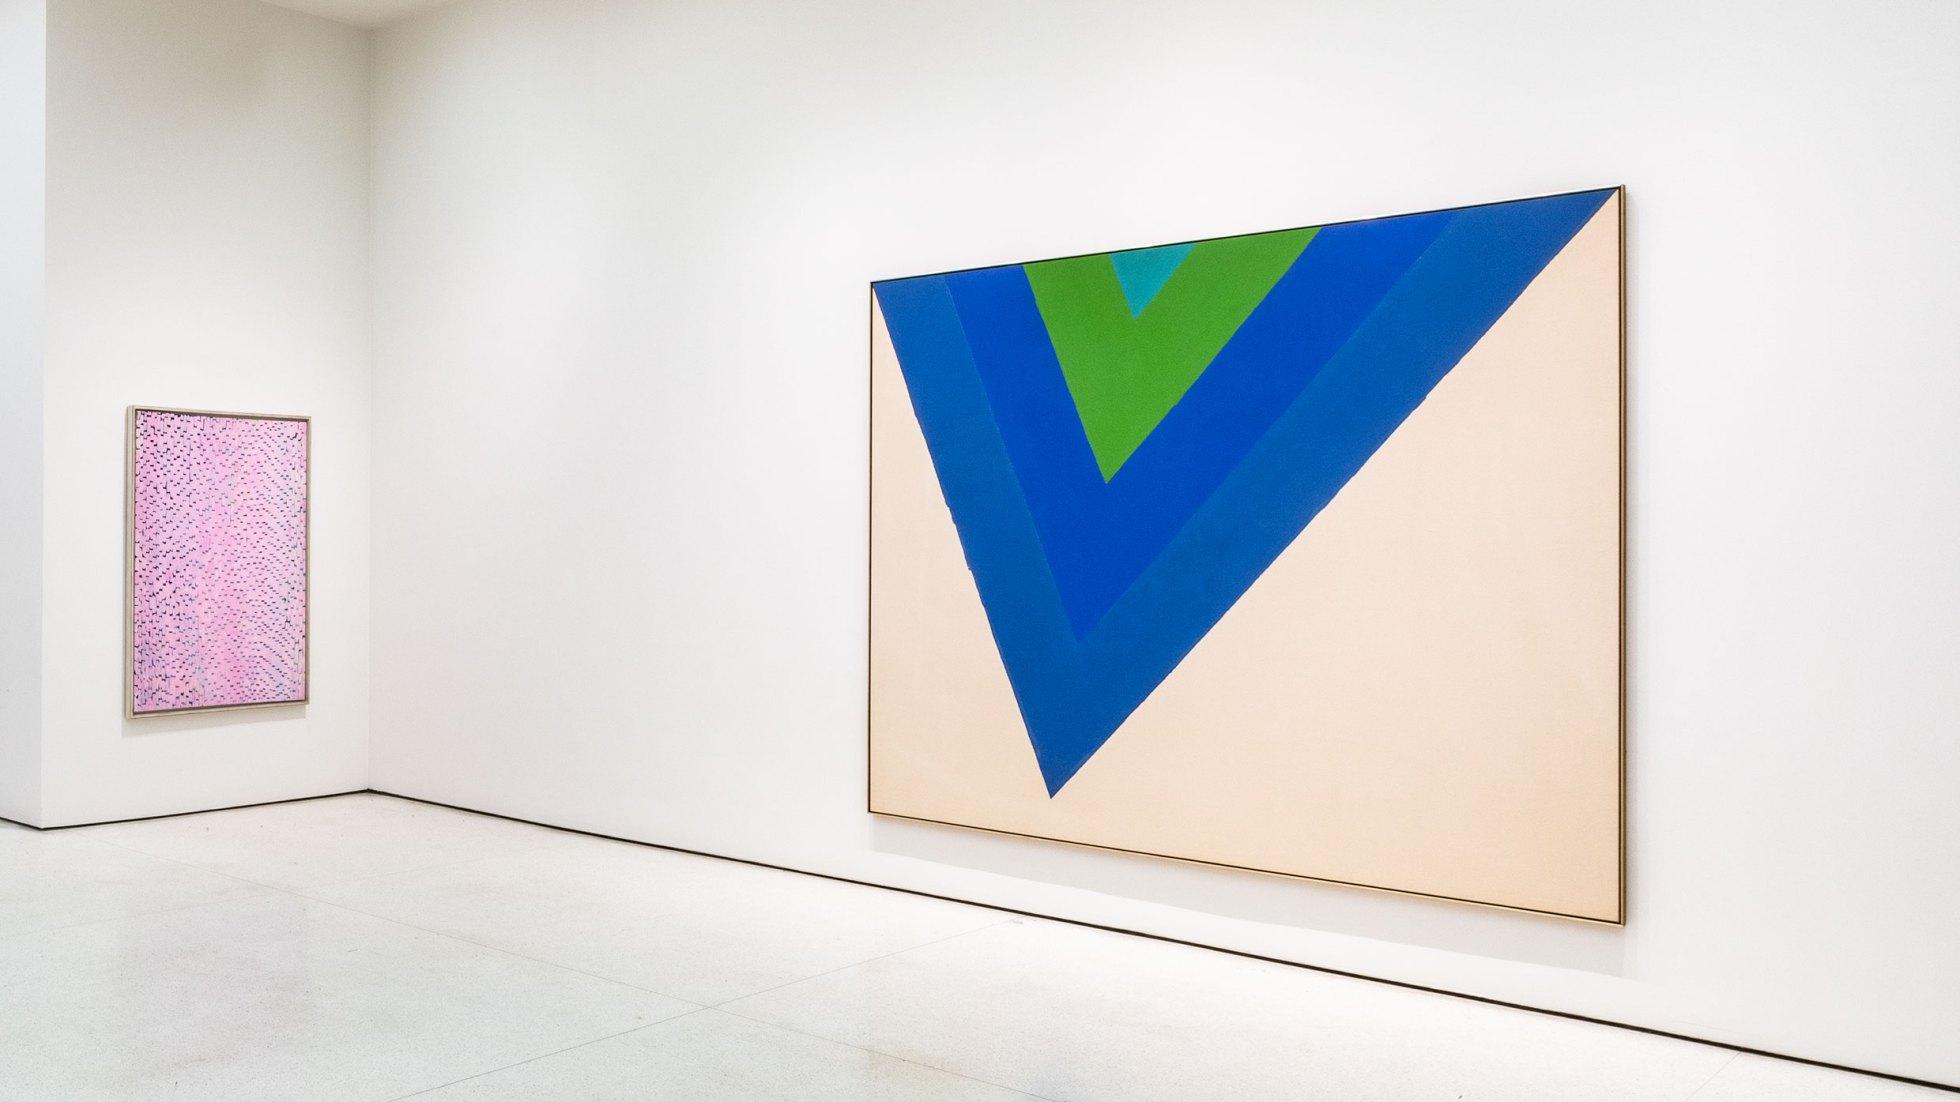 Installation view, The Fullness of Color: 1960s Painting, Solomon R. Guggenheim Museum, New York, December 18, 2019–August 2020. Photo: David Heald